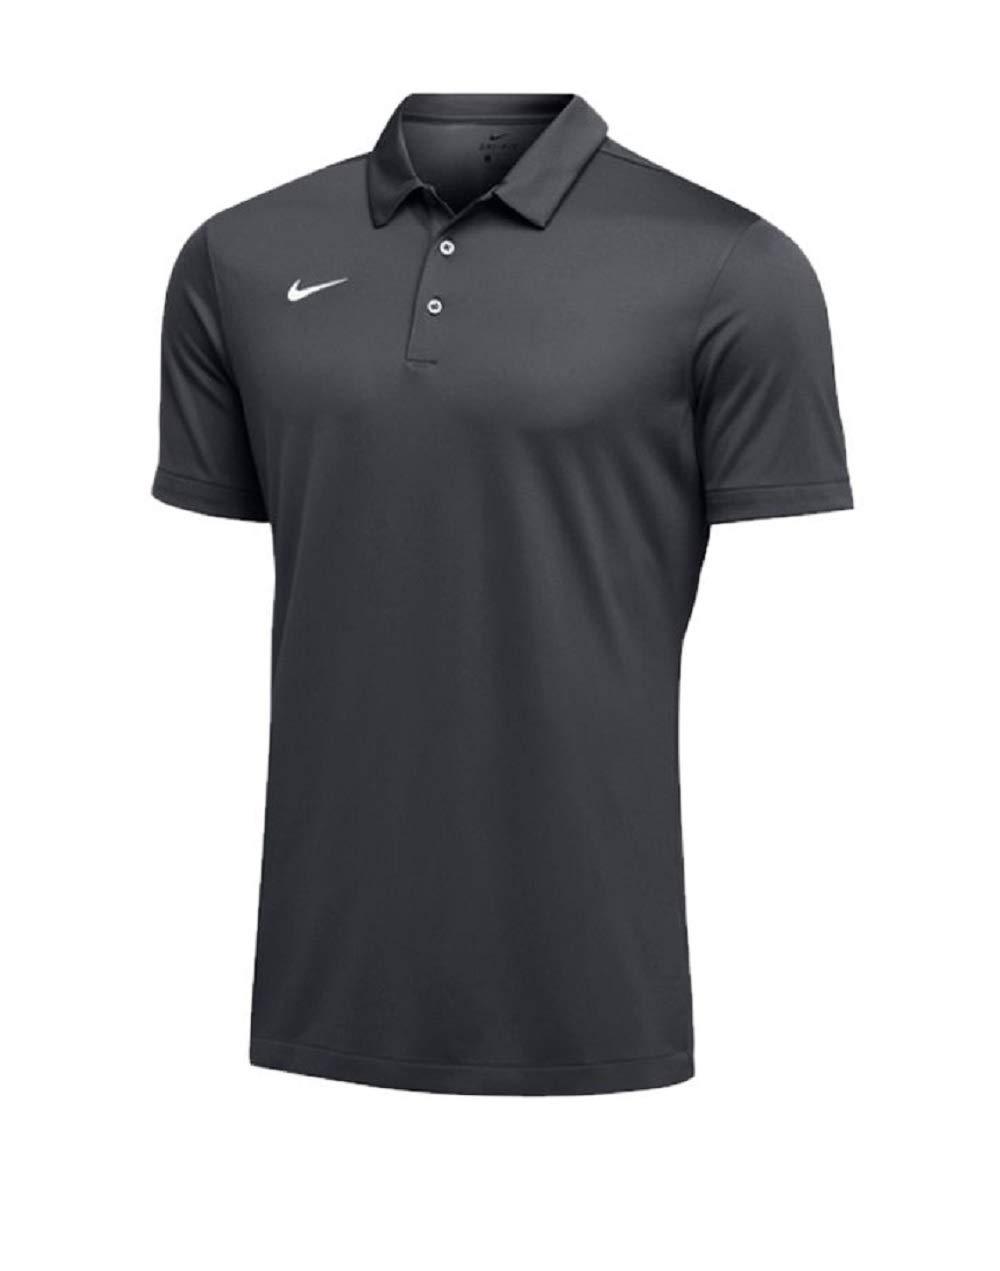 Nike Mens Dri-FIT Short Sleeve Polo Shirt (Medium, Anthracite)